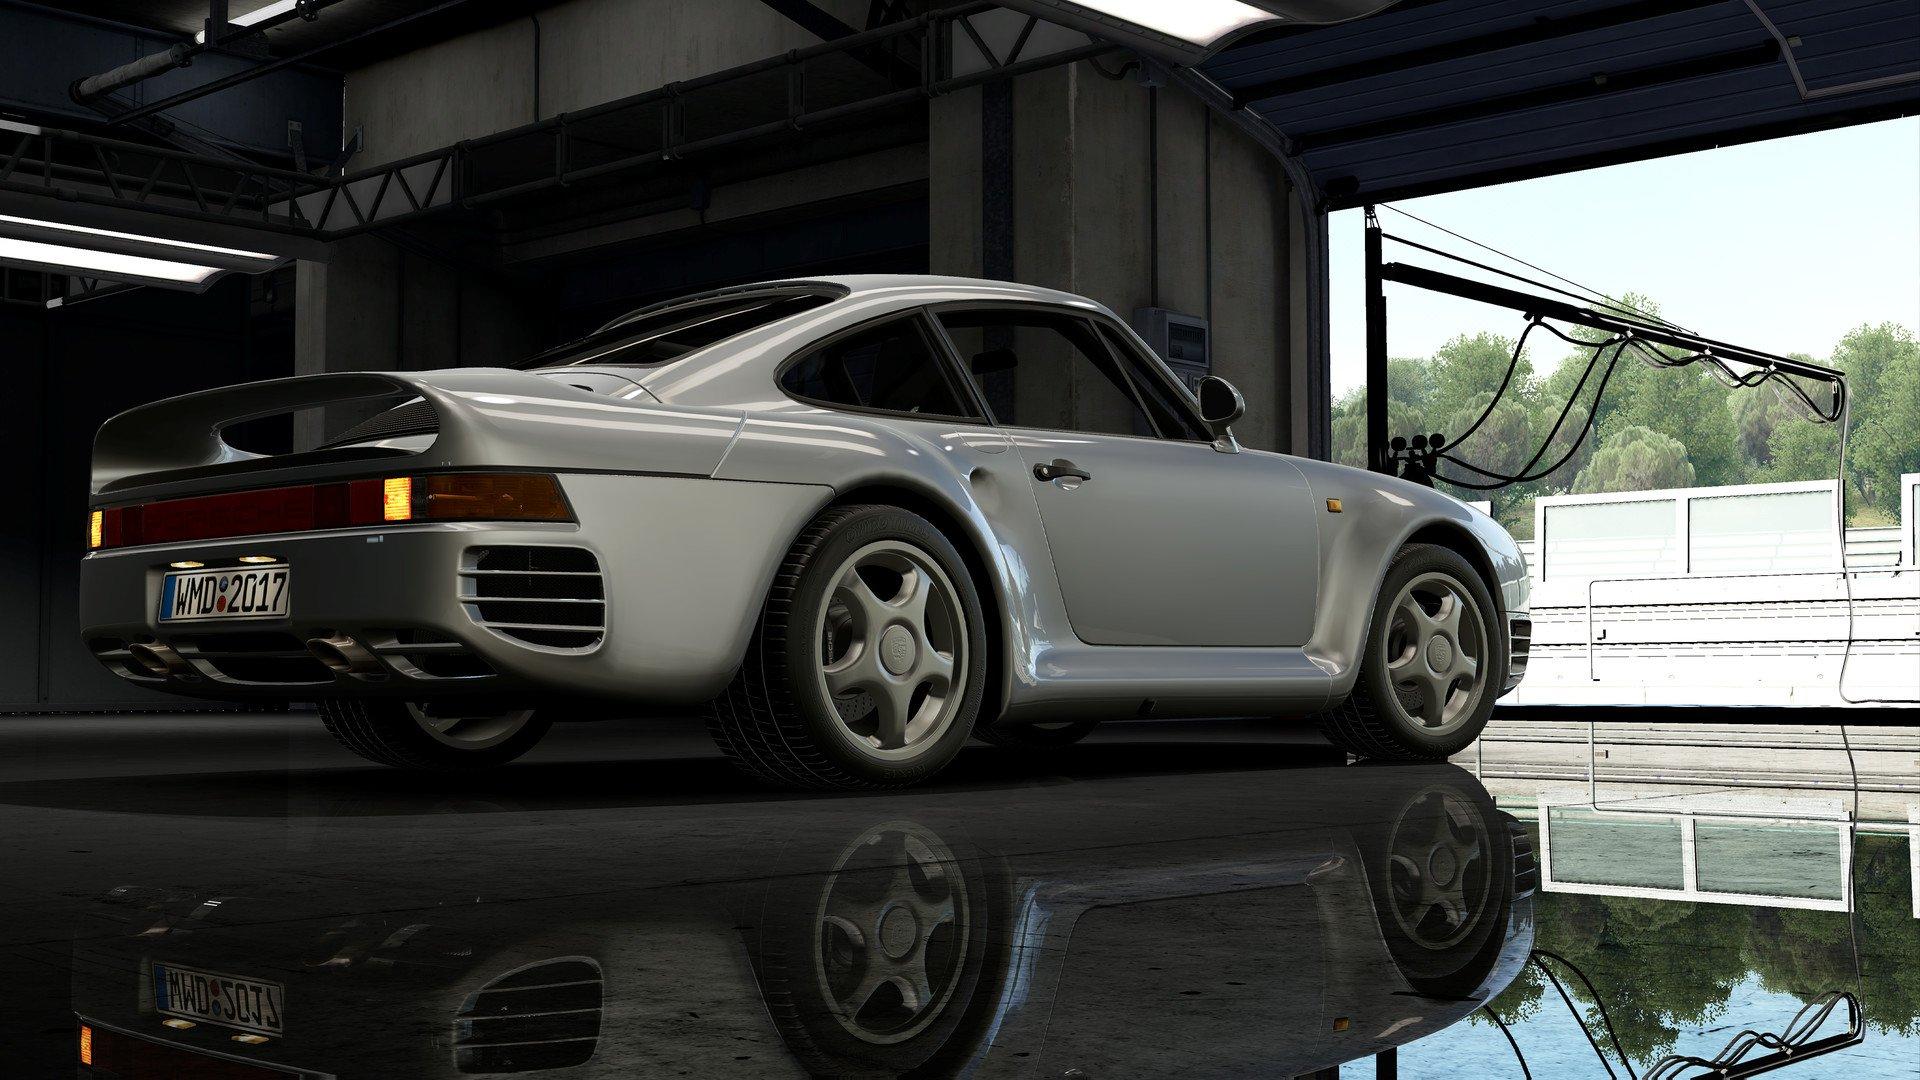 Project CARS 2 Porsche Legends Pack Porsche 959 S